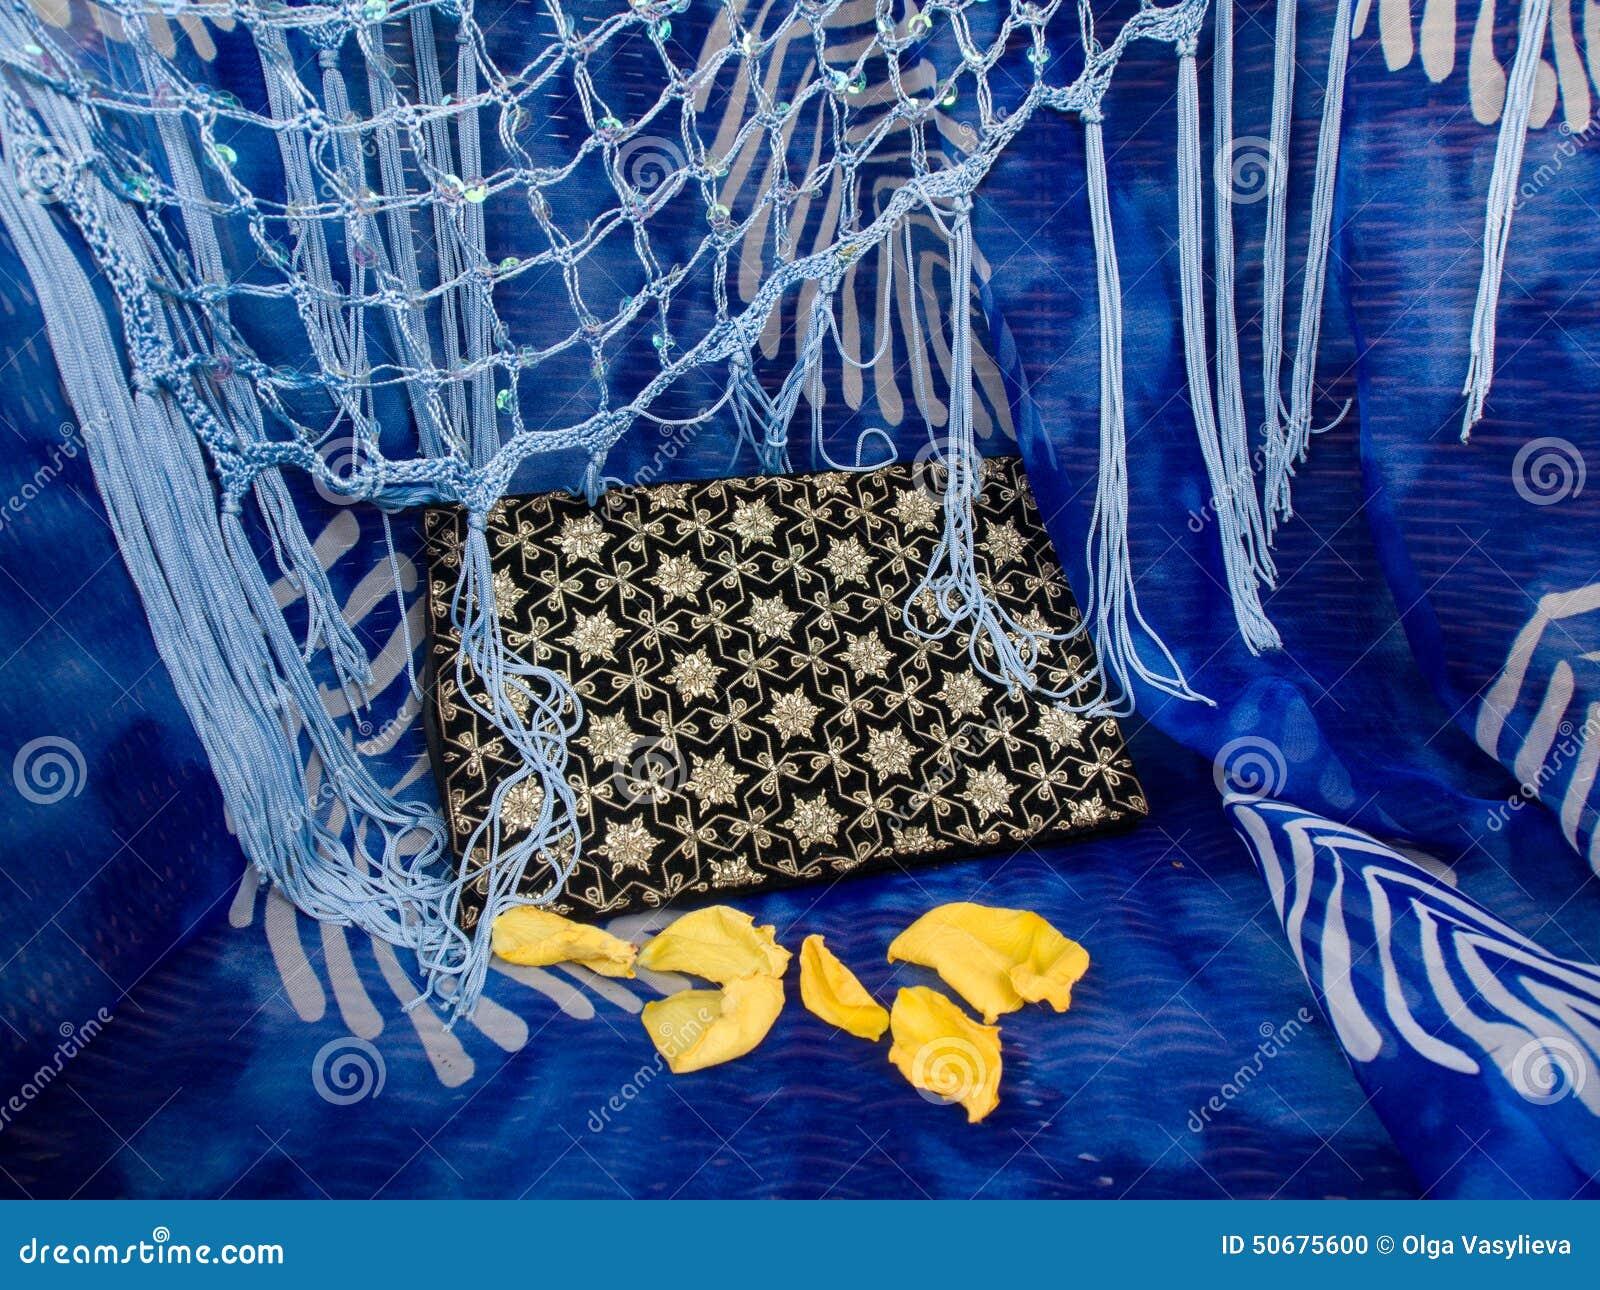 Download 黑钱包和玫瑰花瓣 库存照片. 图片 包括有 诱饵, 黄色, 童年, 钱包, 蓝色, 围巾, 部分, 泪花 - 50675600